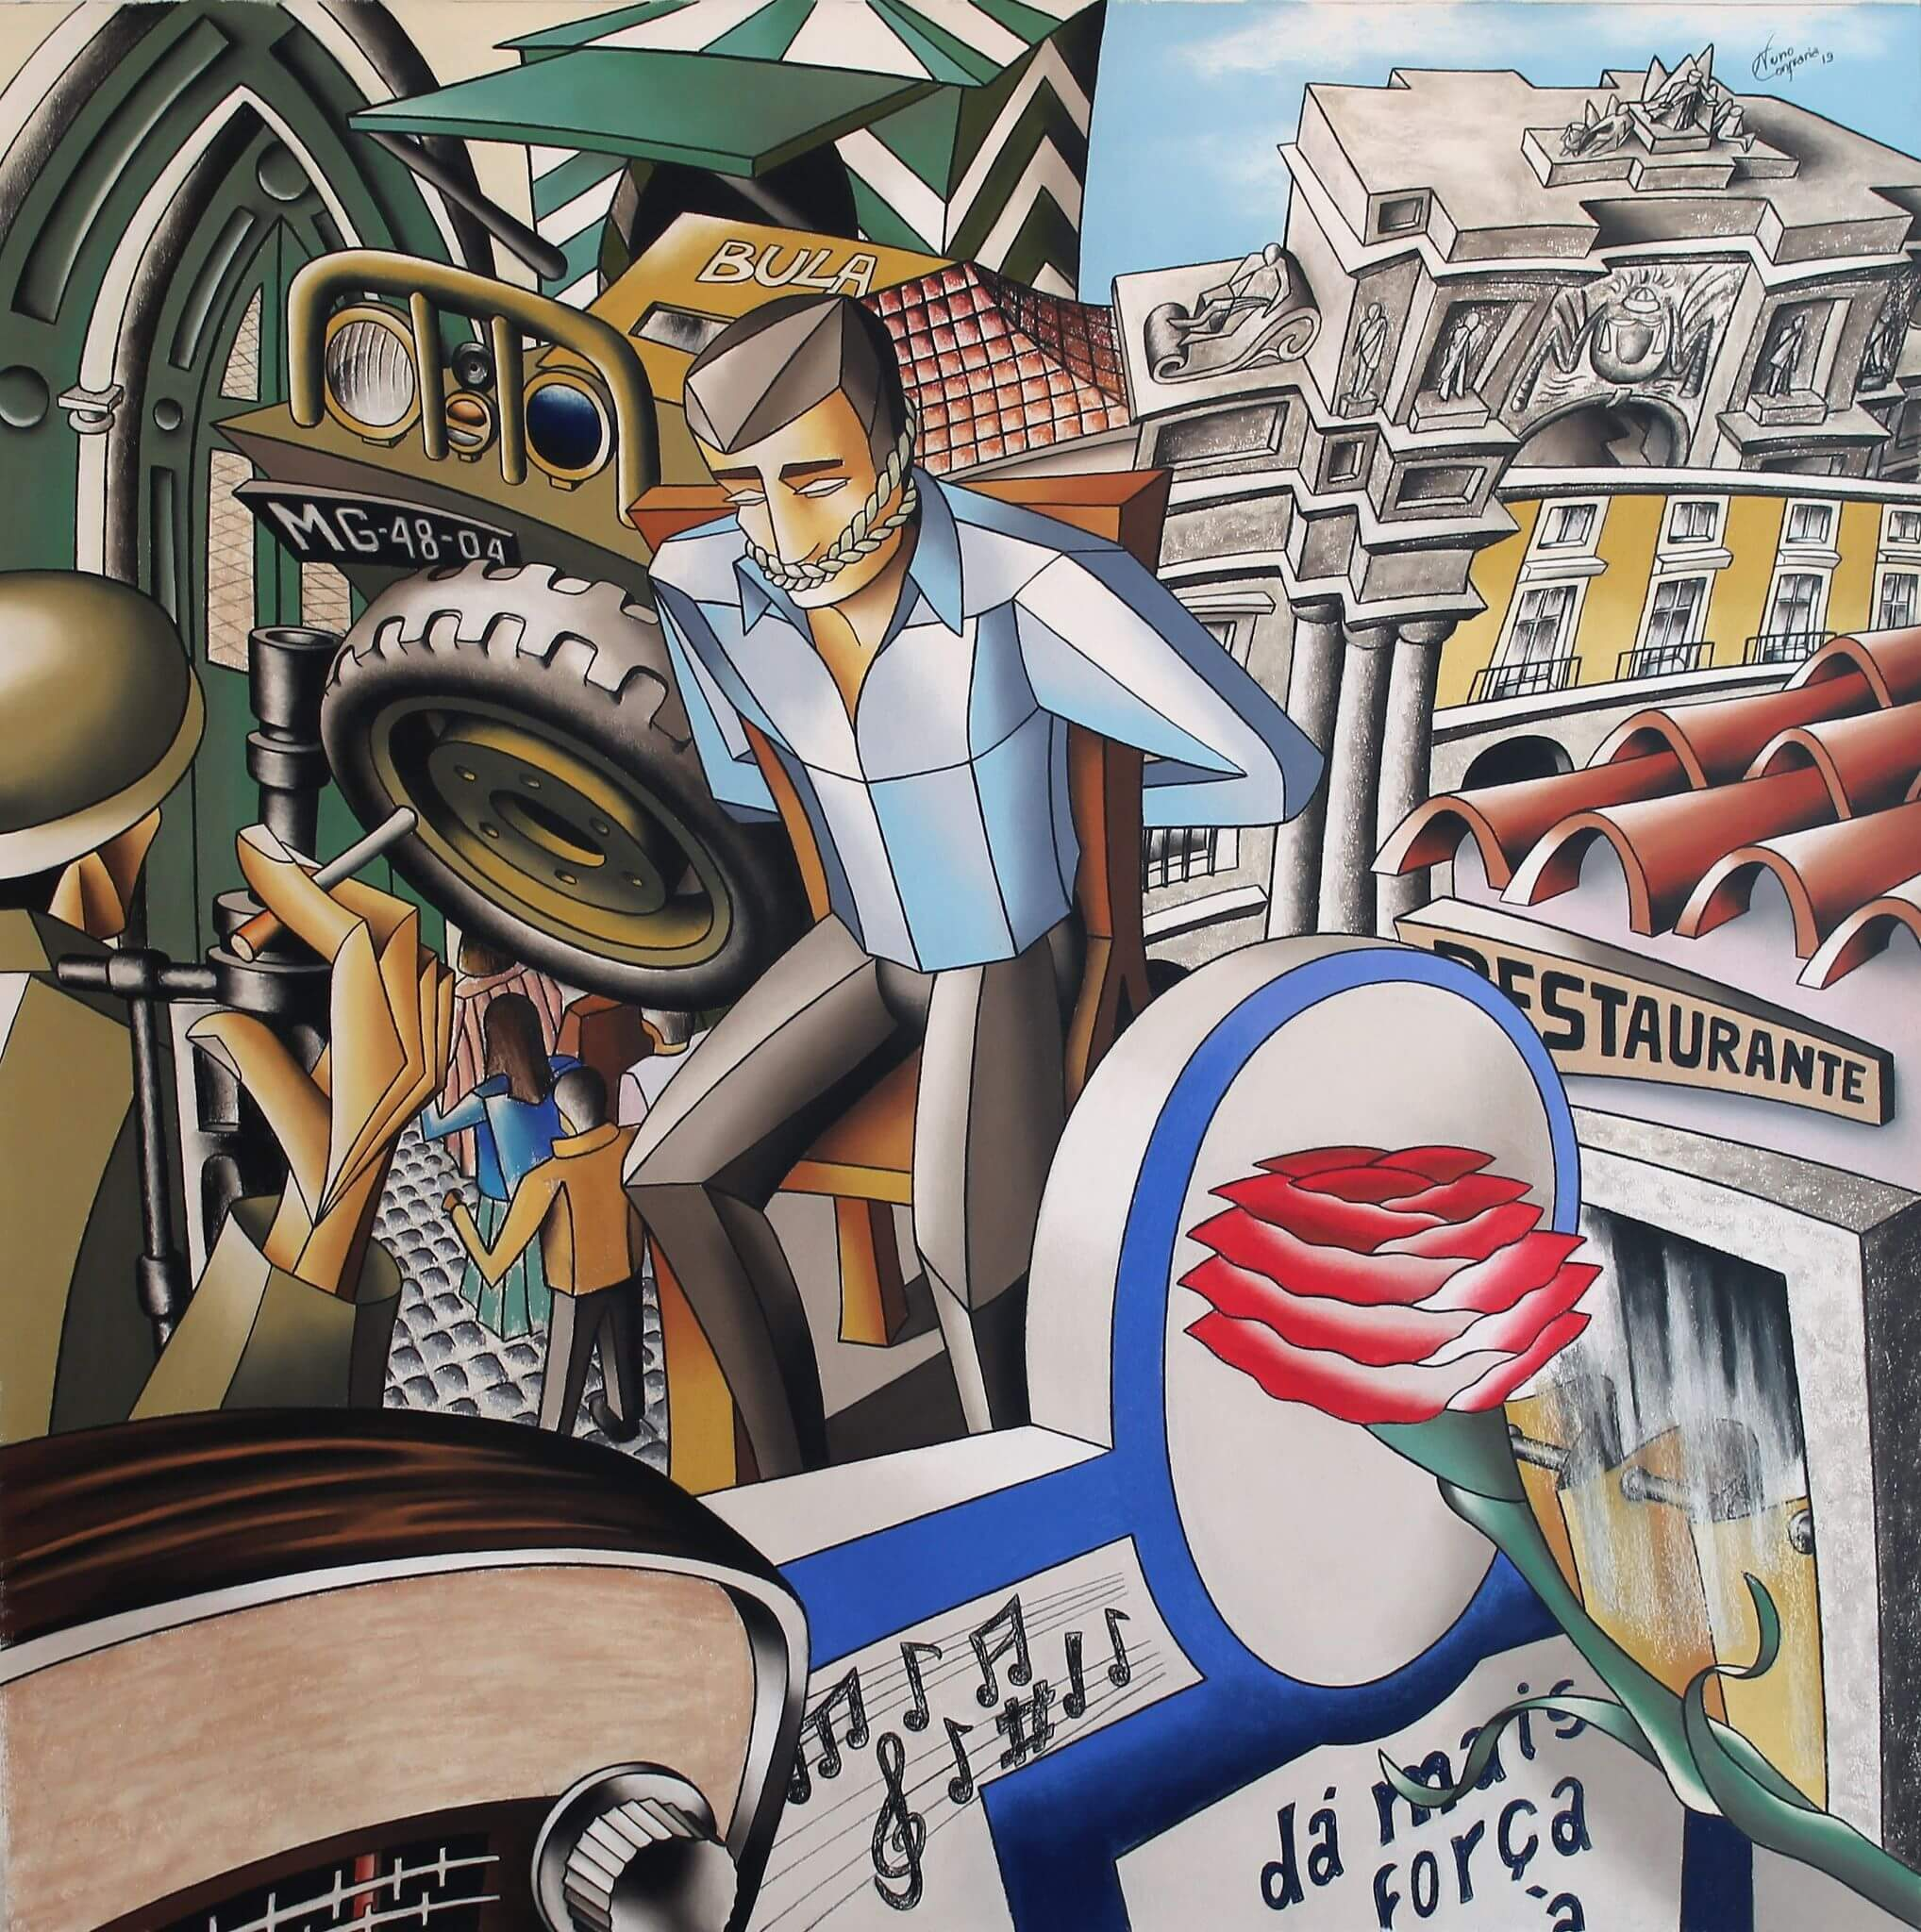 25 de Abril -A liberdade criativa de Nuno Confraria